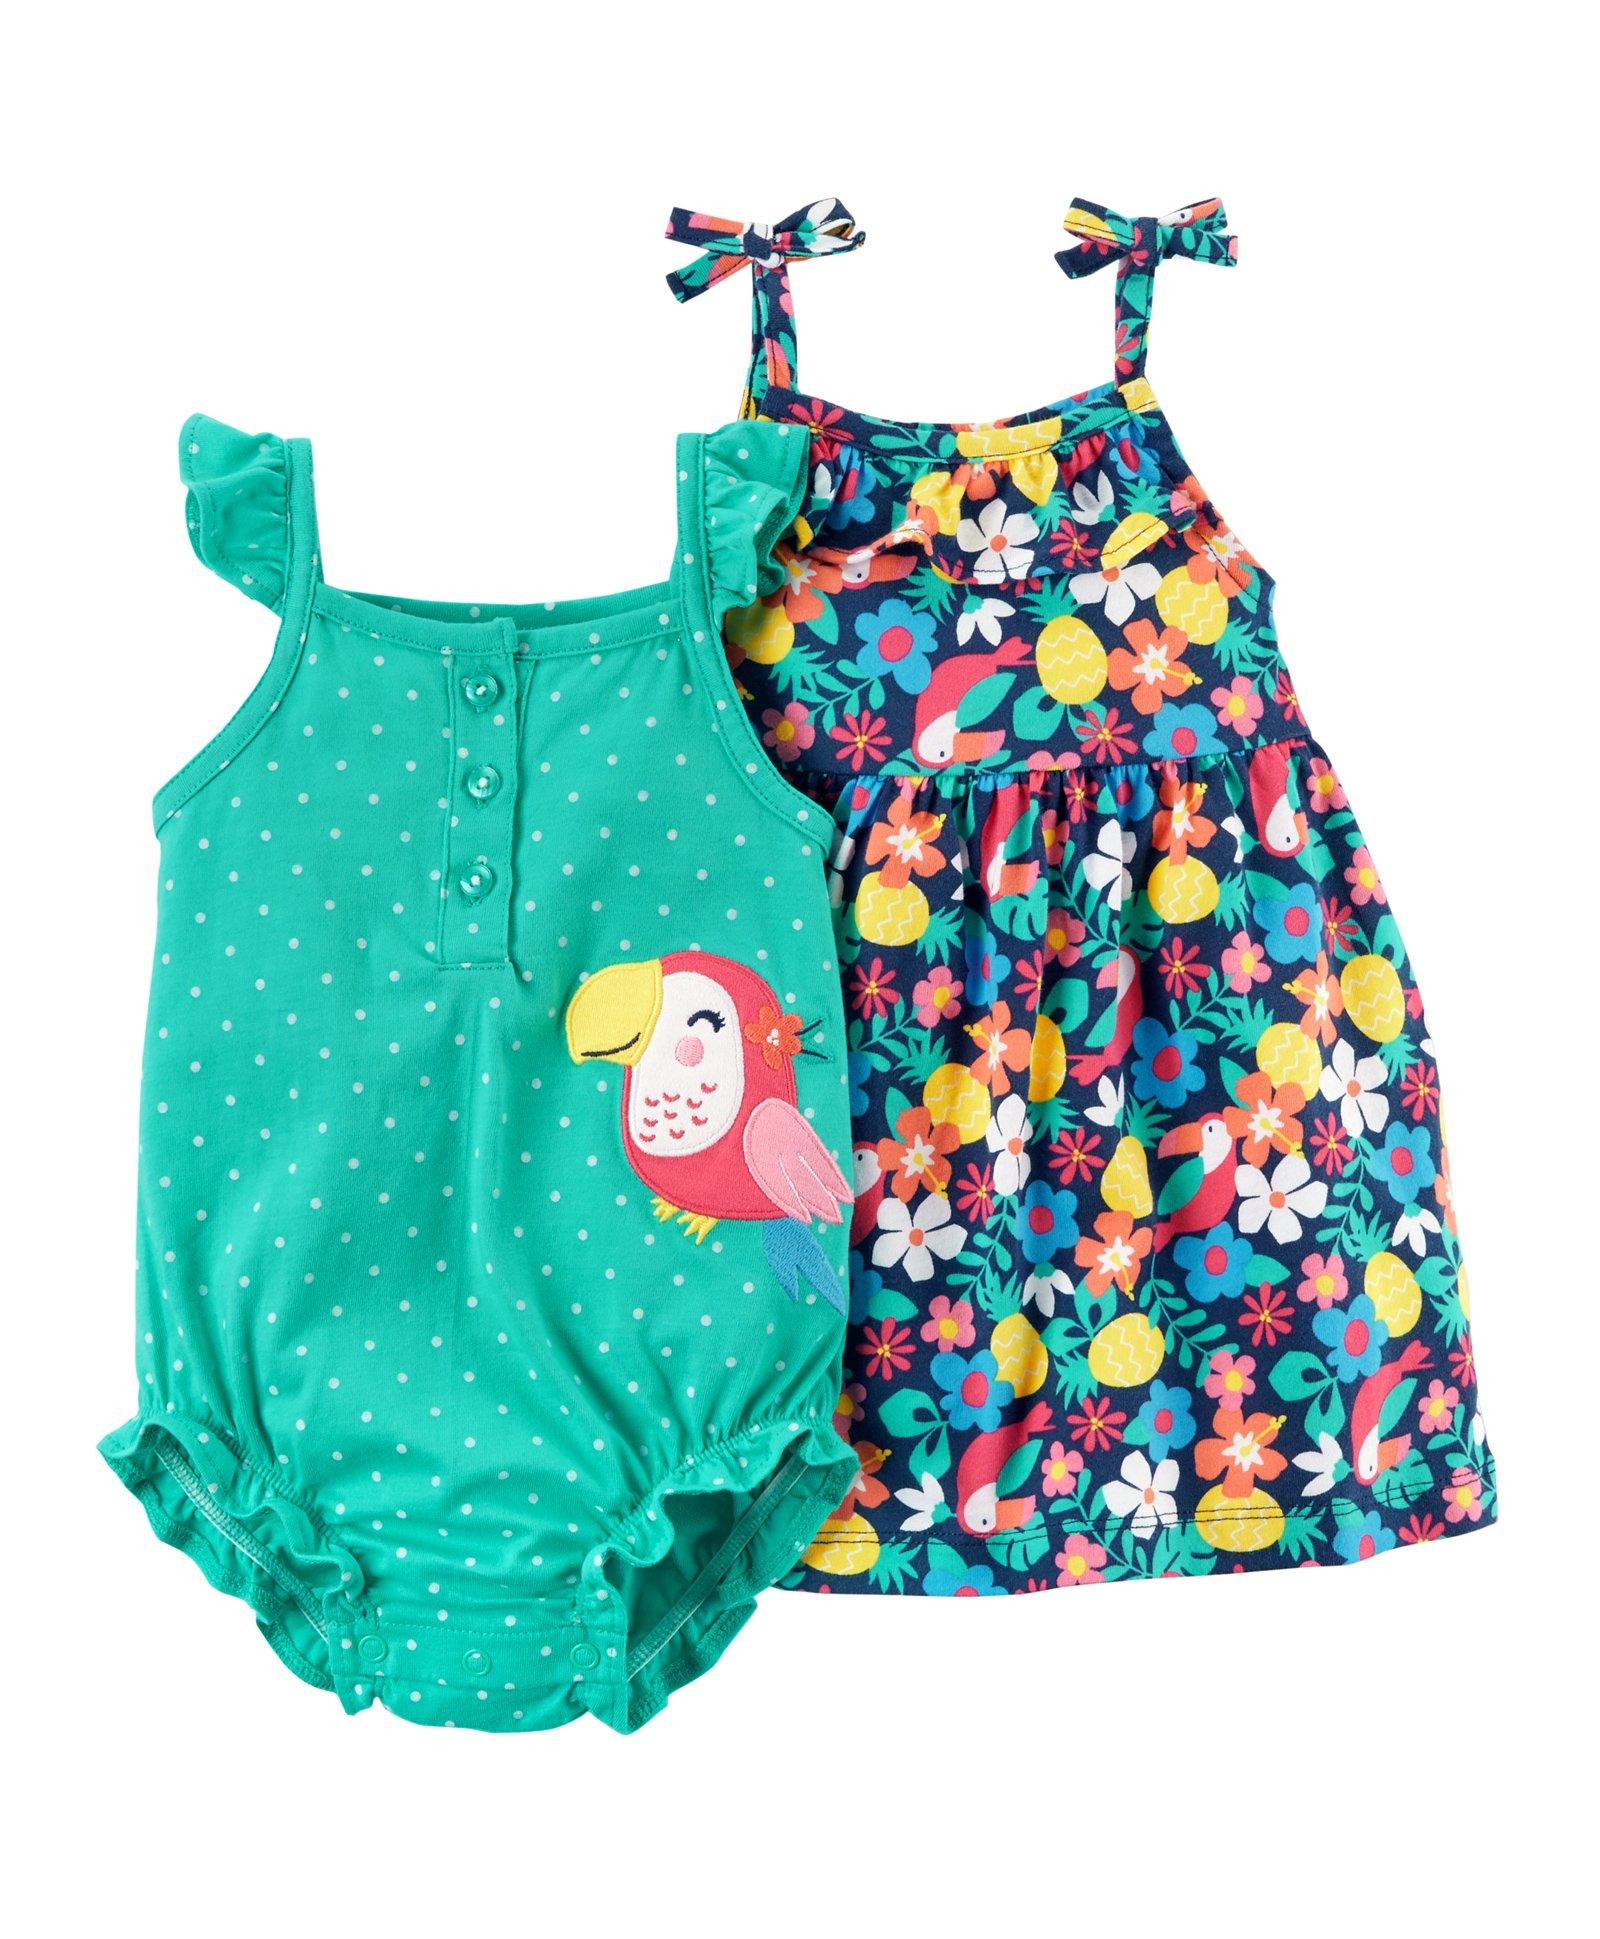 6971d4d51c8 Carter s 2-Piece Floral Dress   Toucan Romper Set - Green   Blue. 12 to 18  Months ...